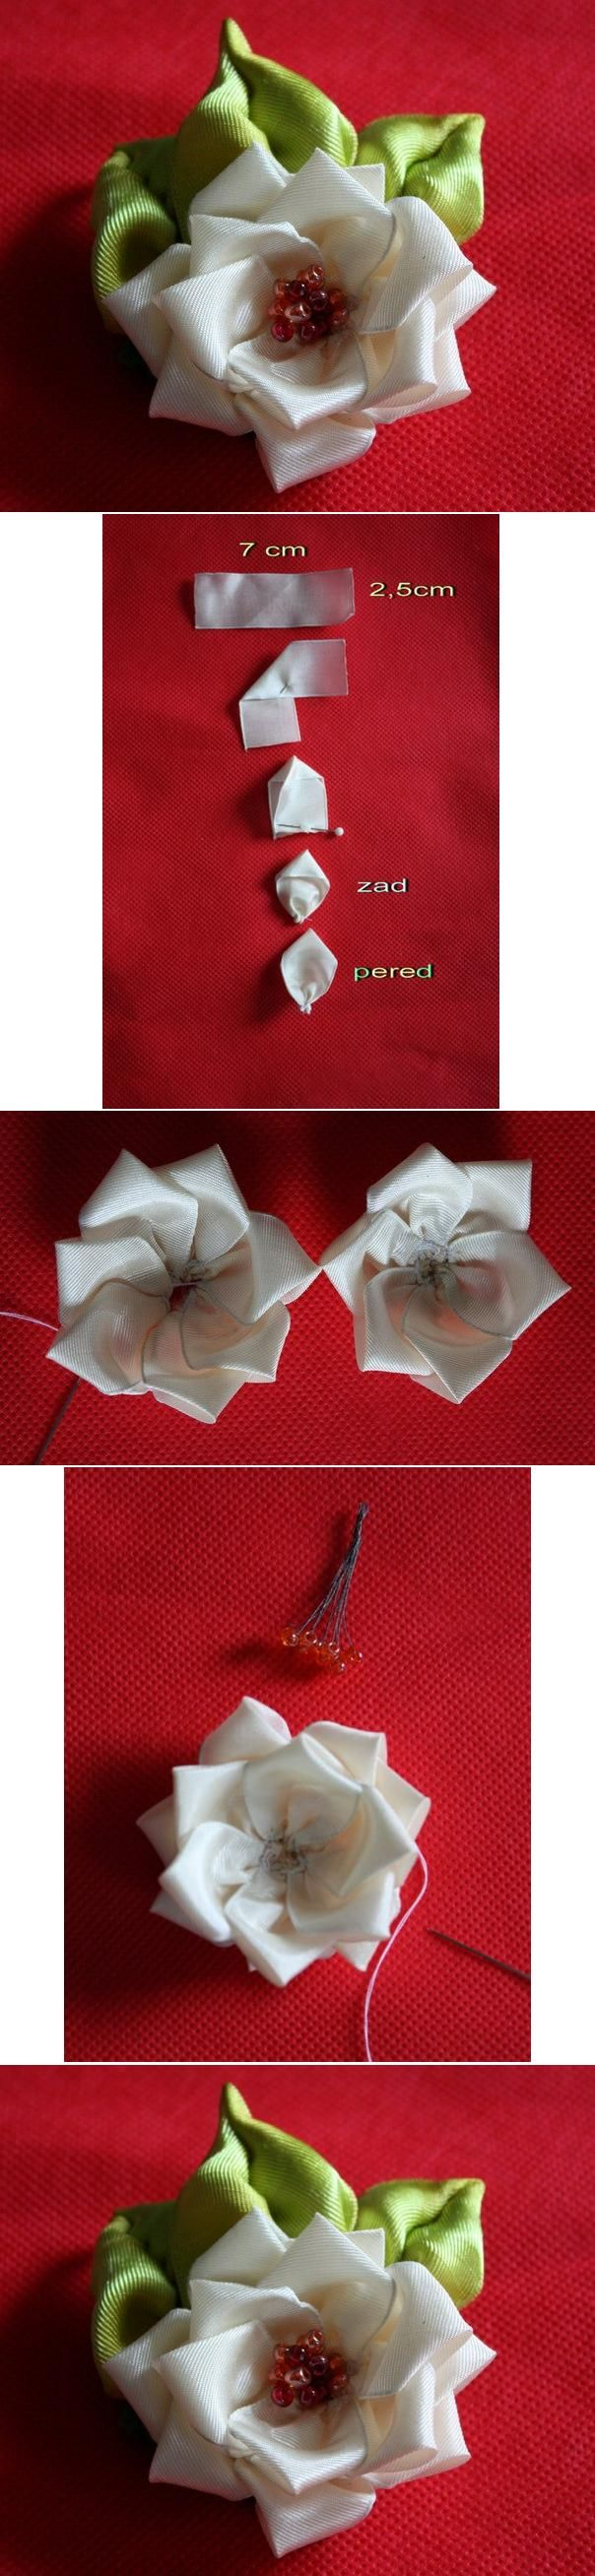 DIY Simple Flower Brooch DIY Projects